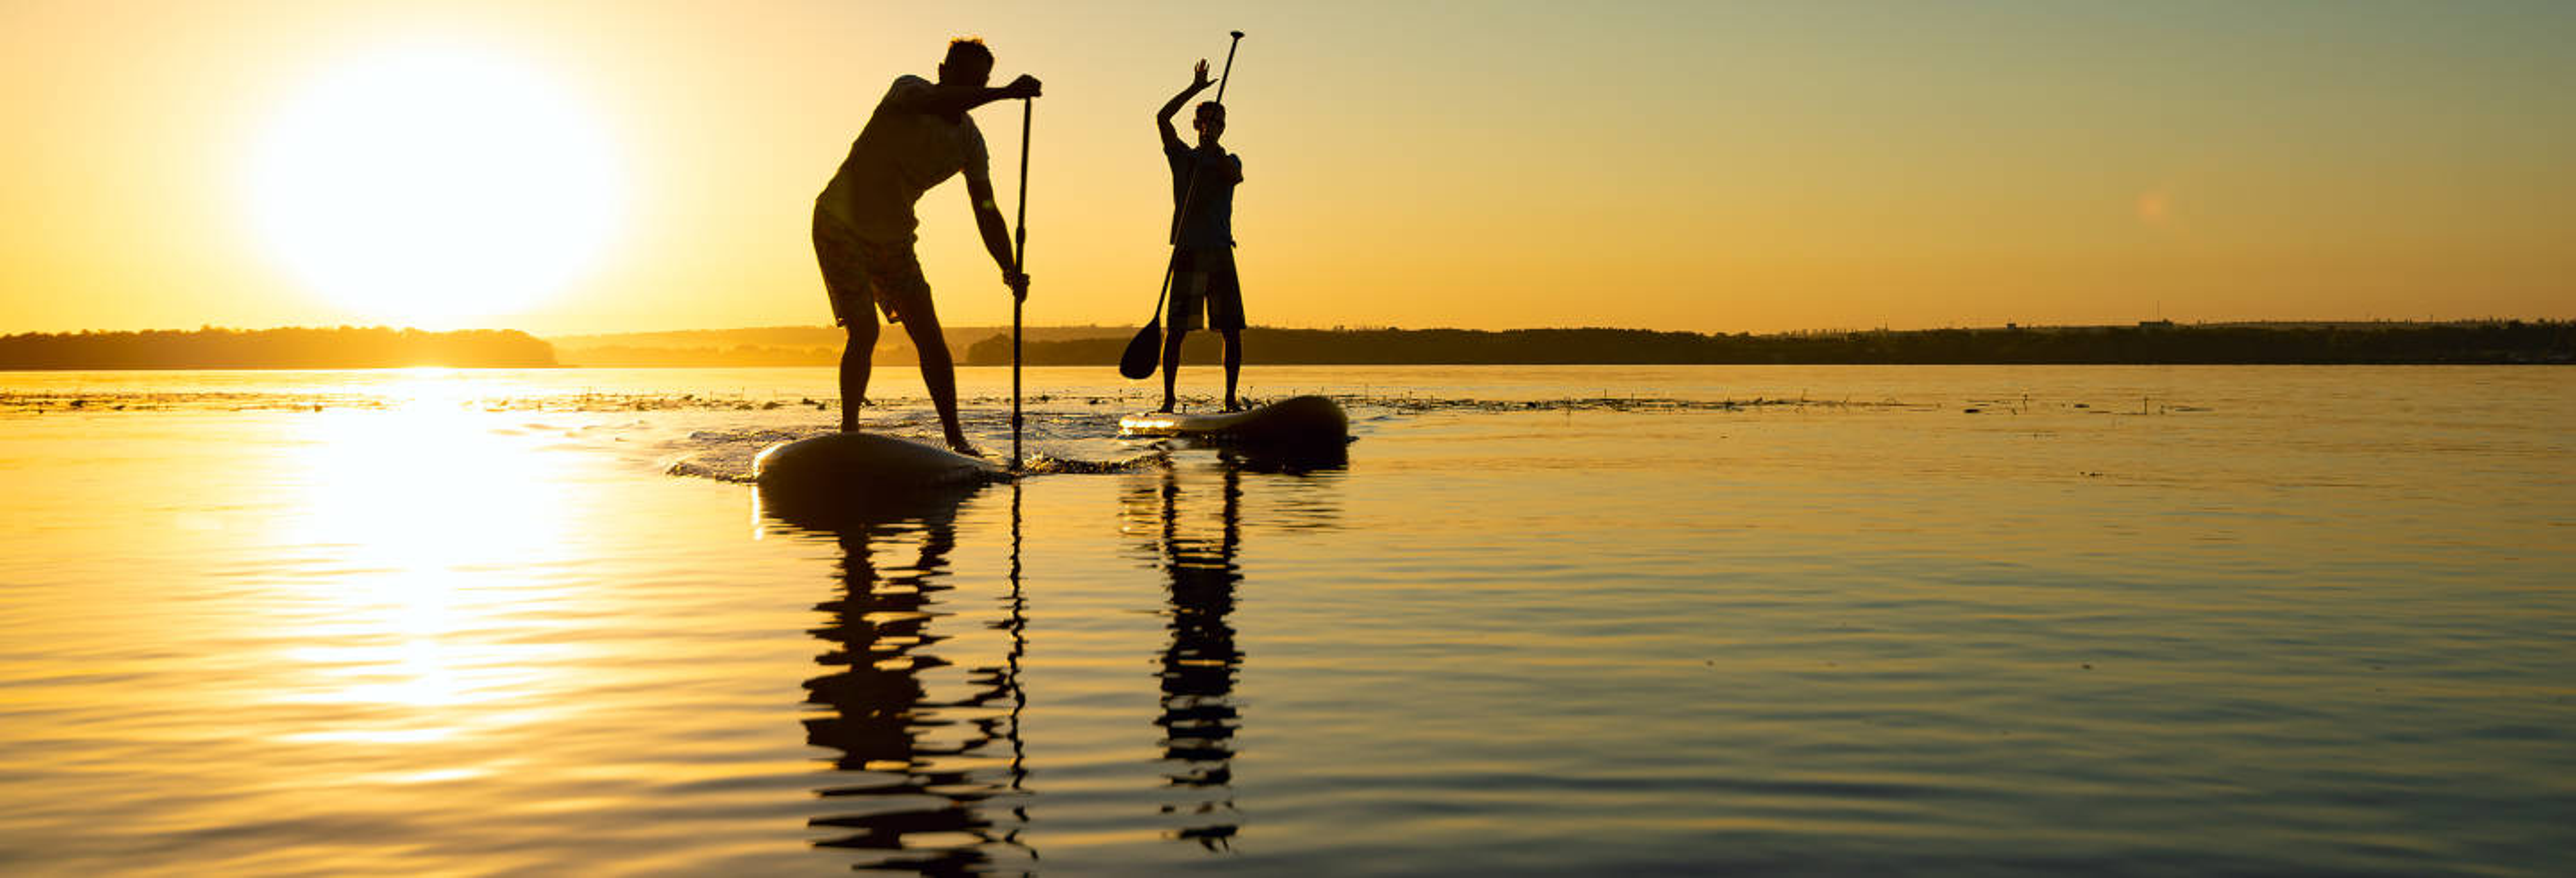 Tour en paddle surf por Ribadesella